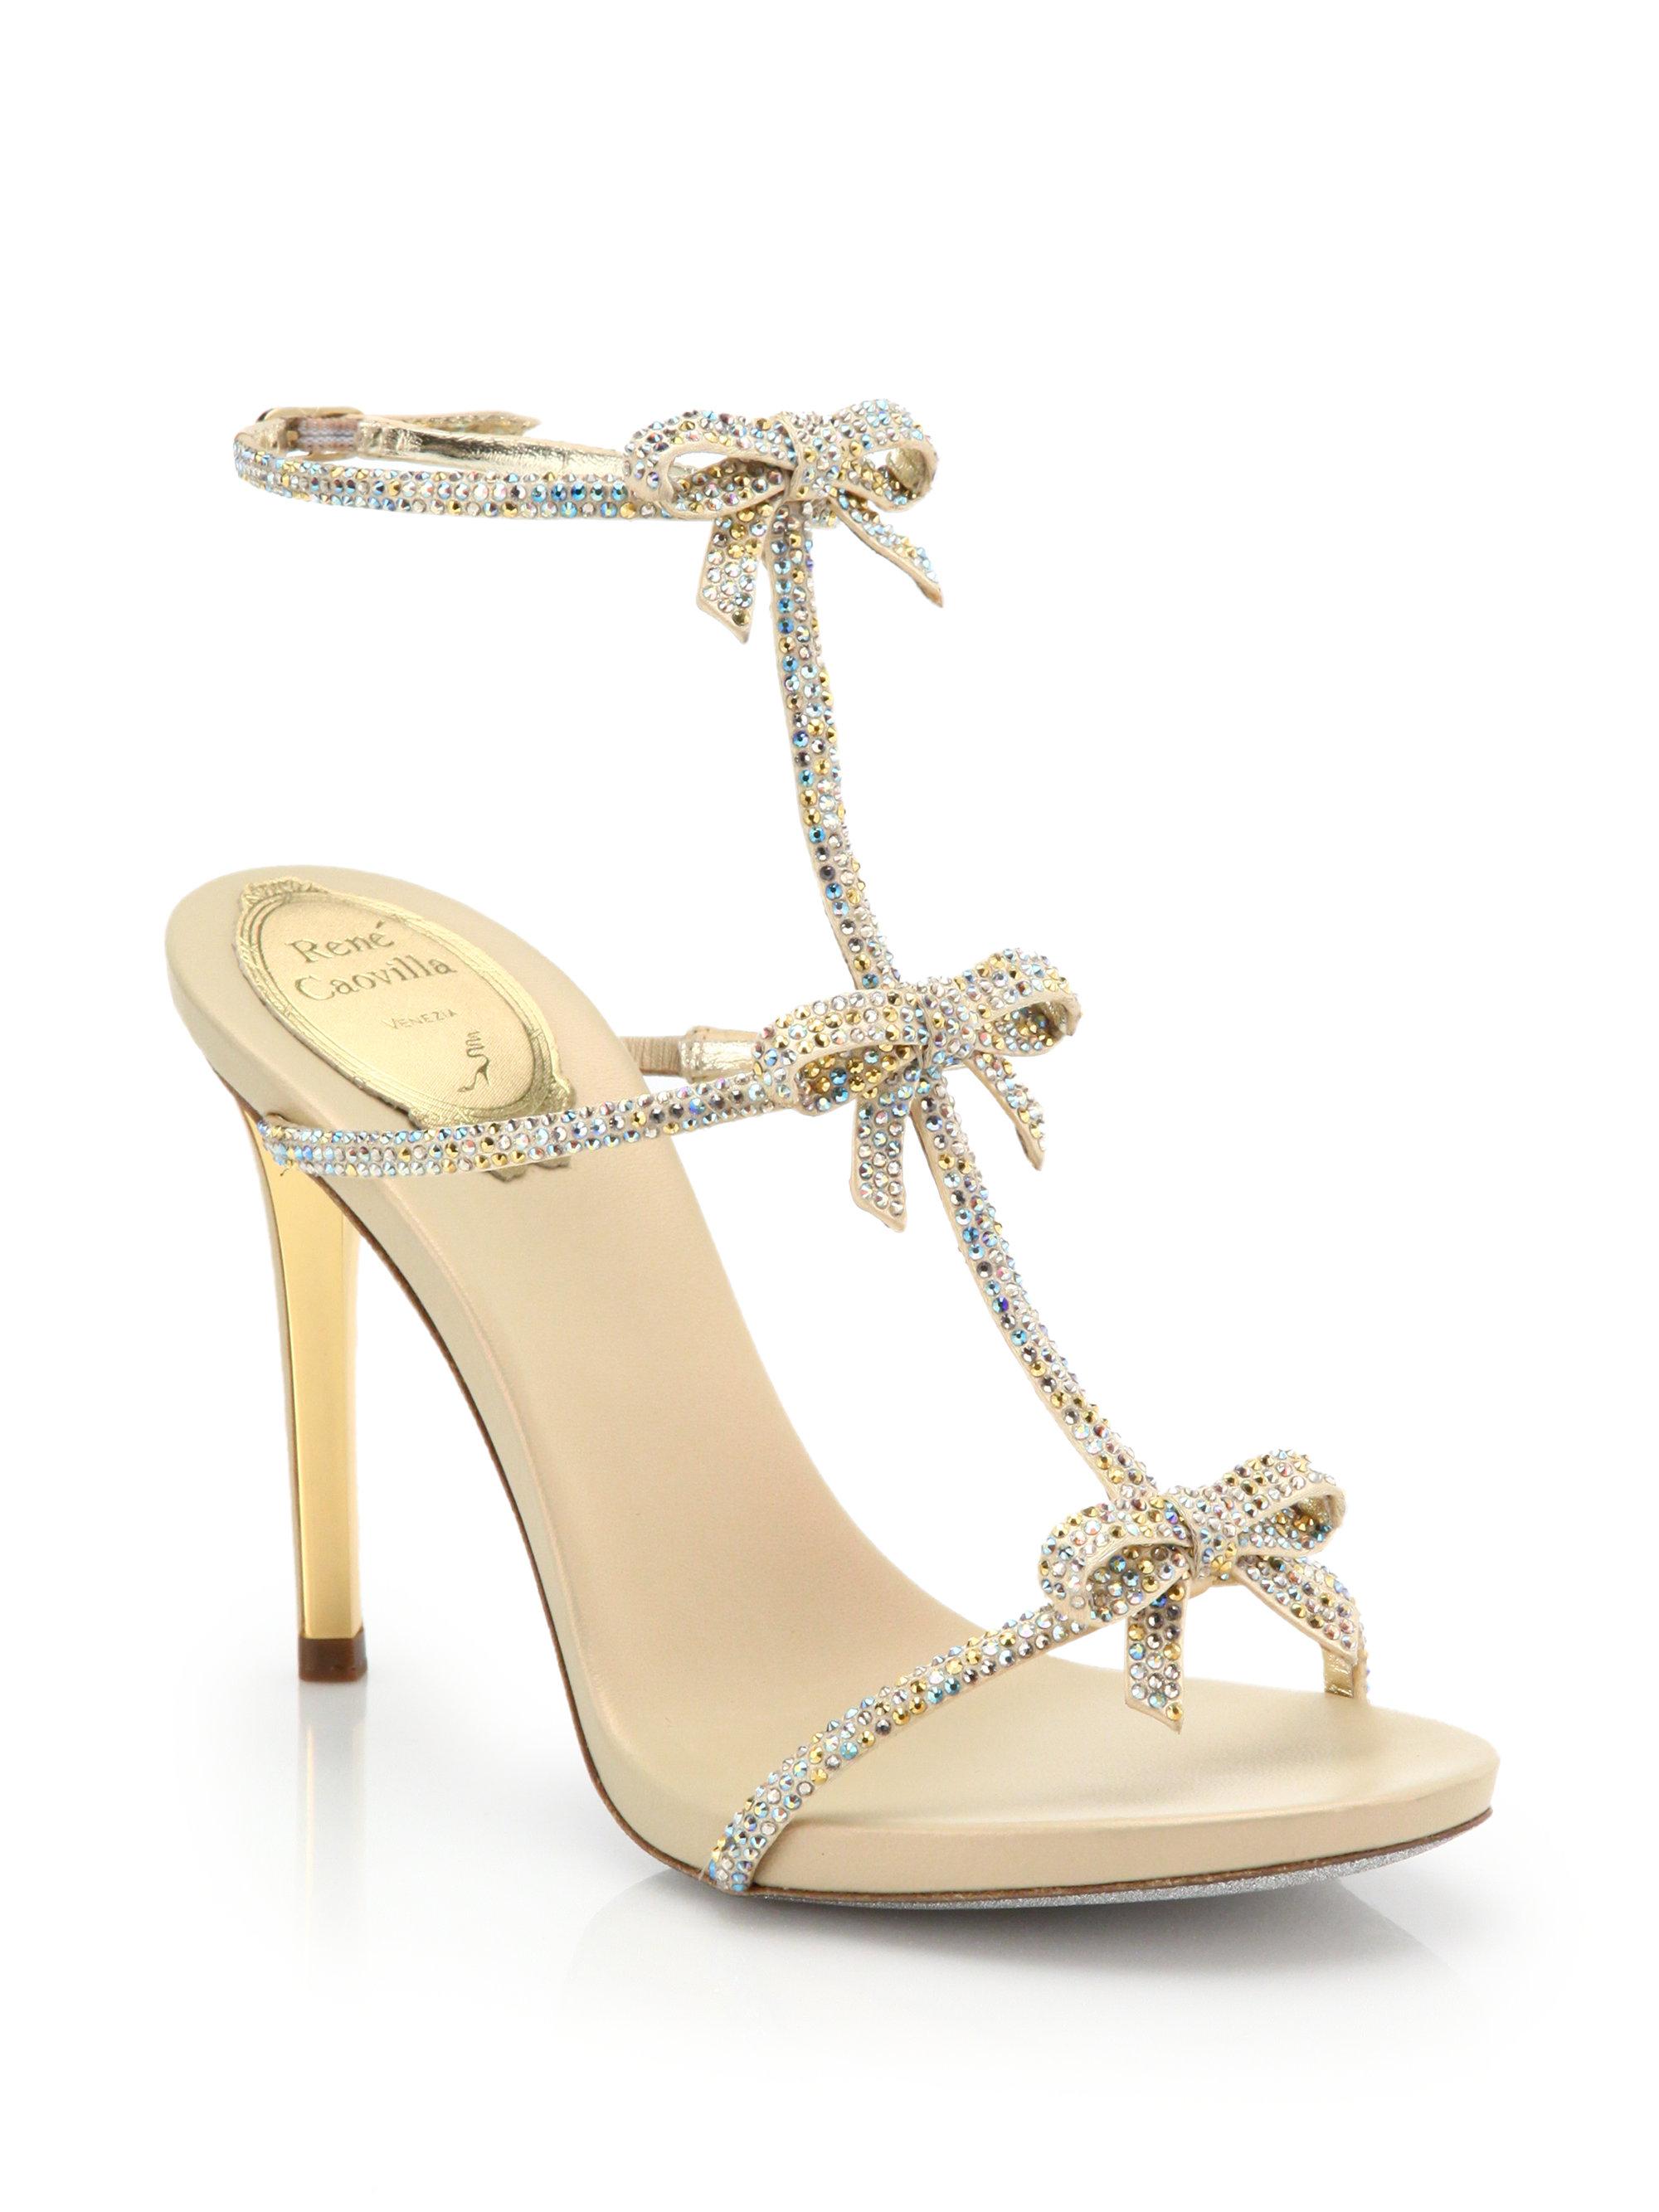 e337c4cd12b Lyst - Rene Caovilla Strass Swarovski Crystal Bow Sandals in Metallic